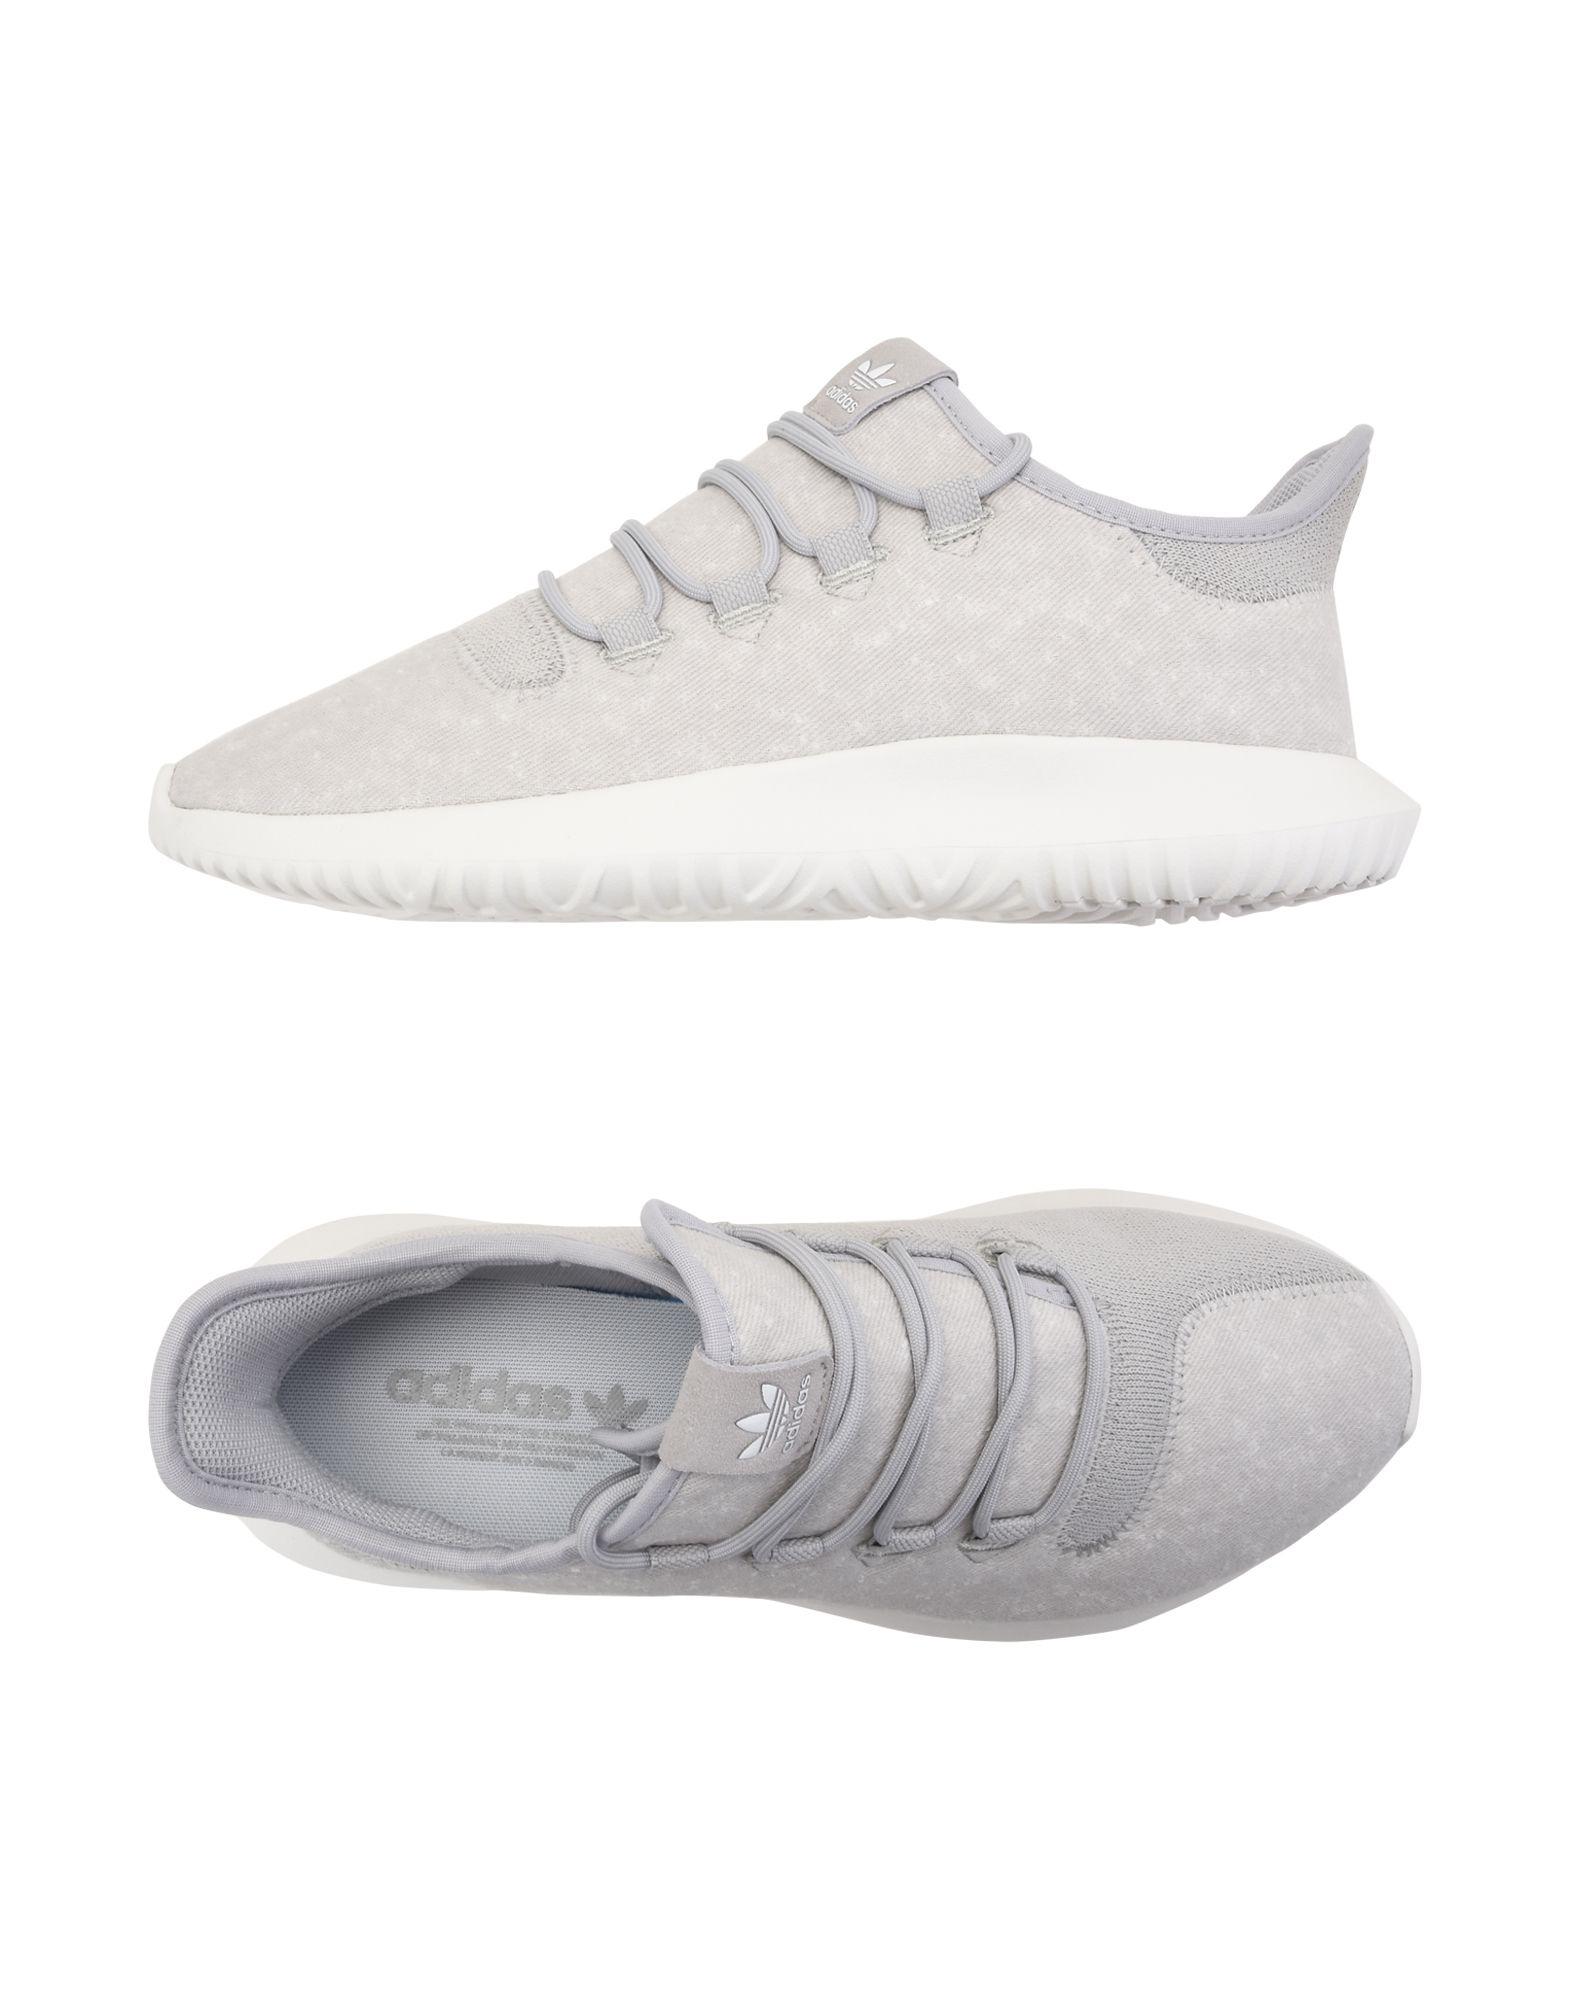 ADIDAS ORIGINALS Низкие кеды и кроссовки кроссовки adidas кроссовки муж equipment running s clonix stpanu ftwwht